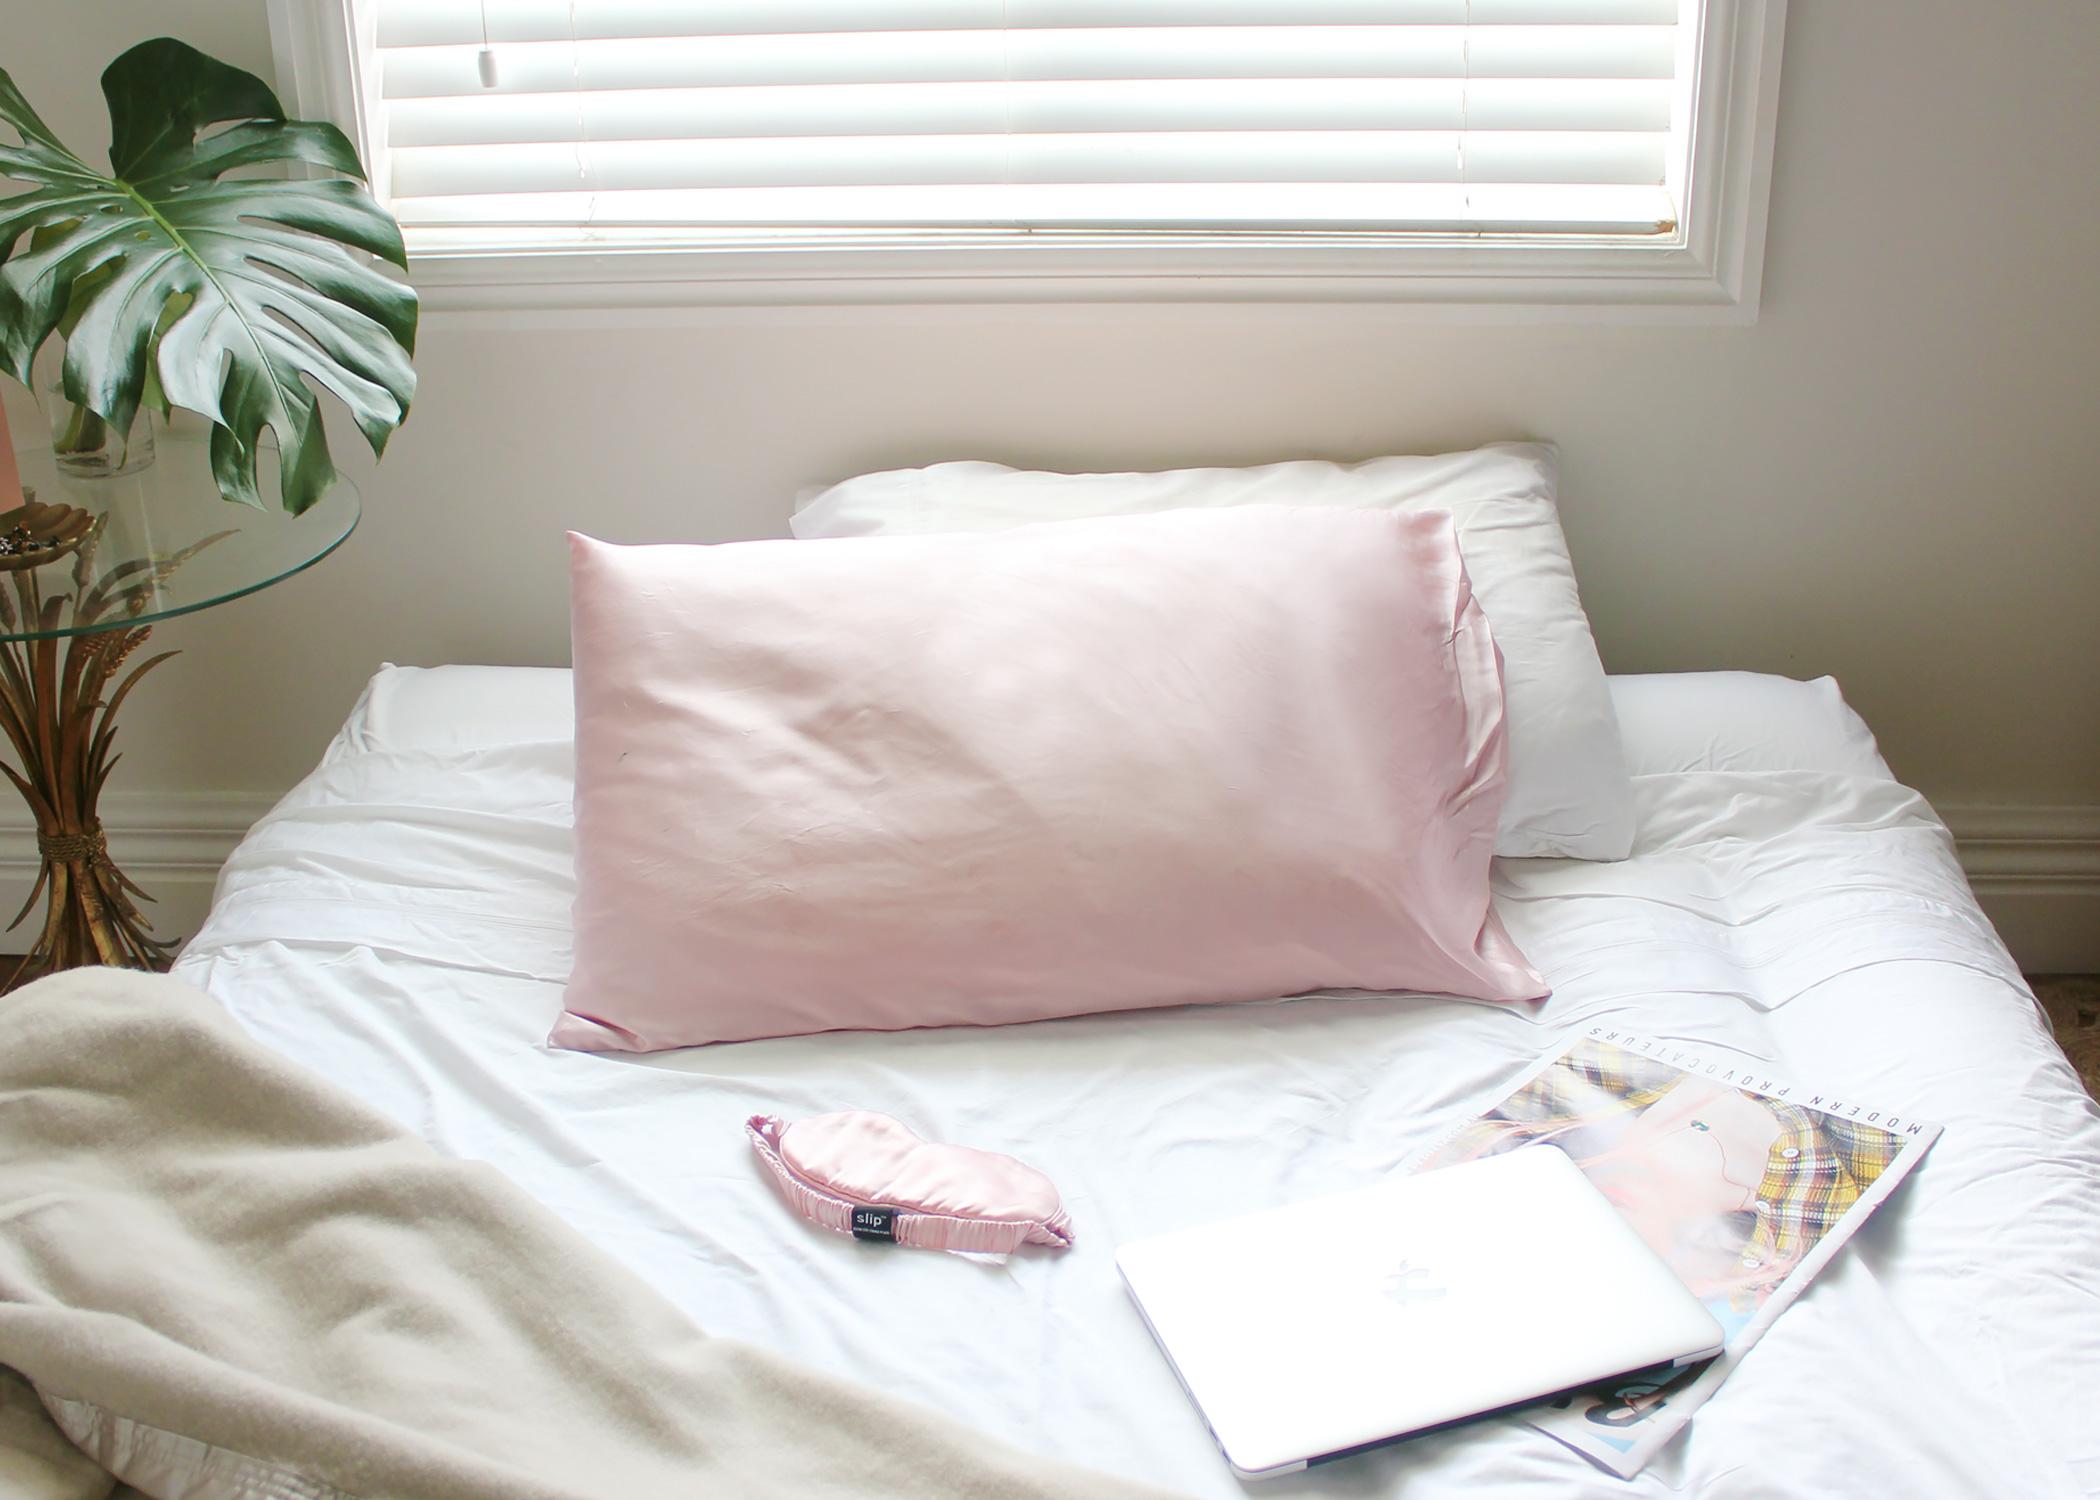 Slip Pillow Case Tips for a better beauty sleep